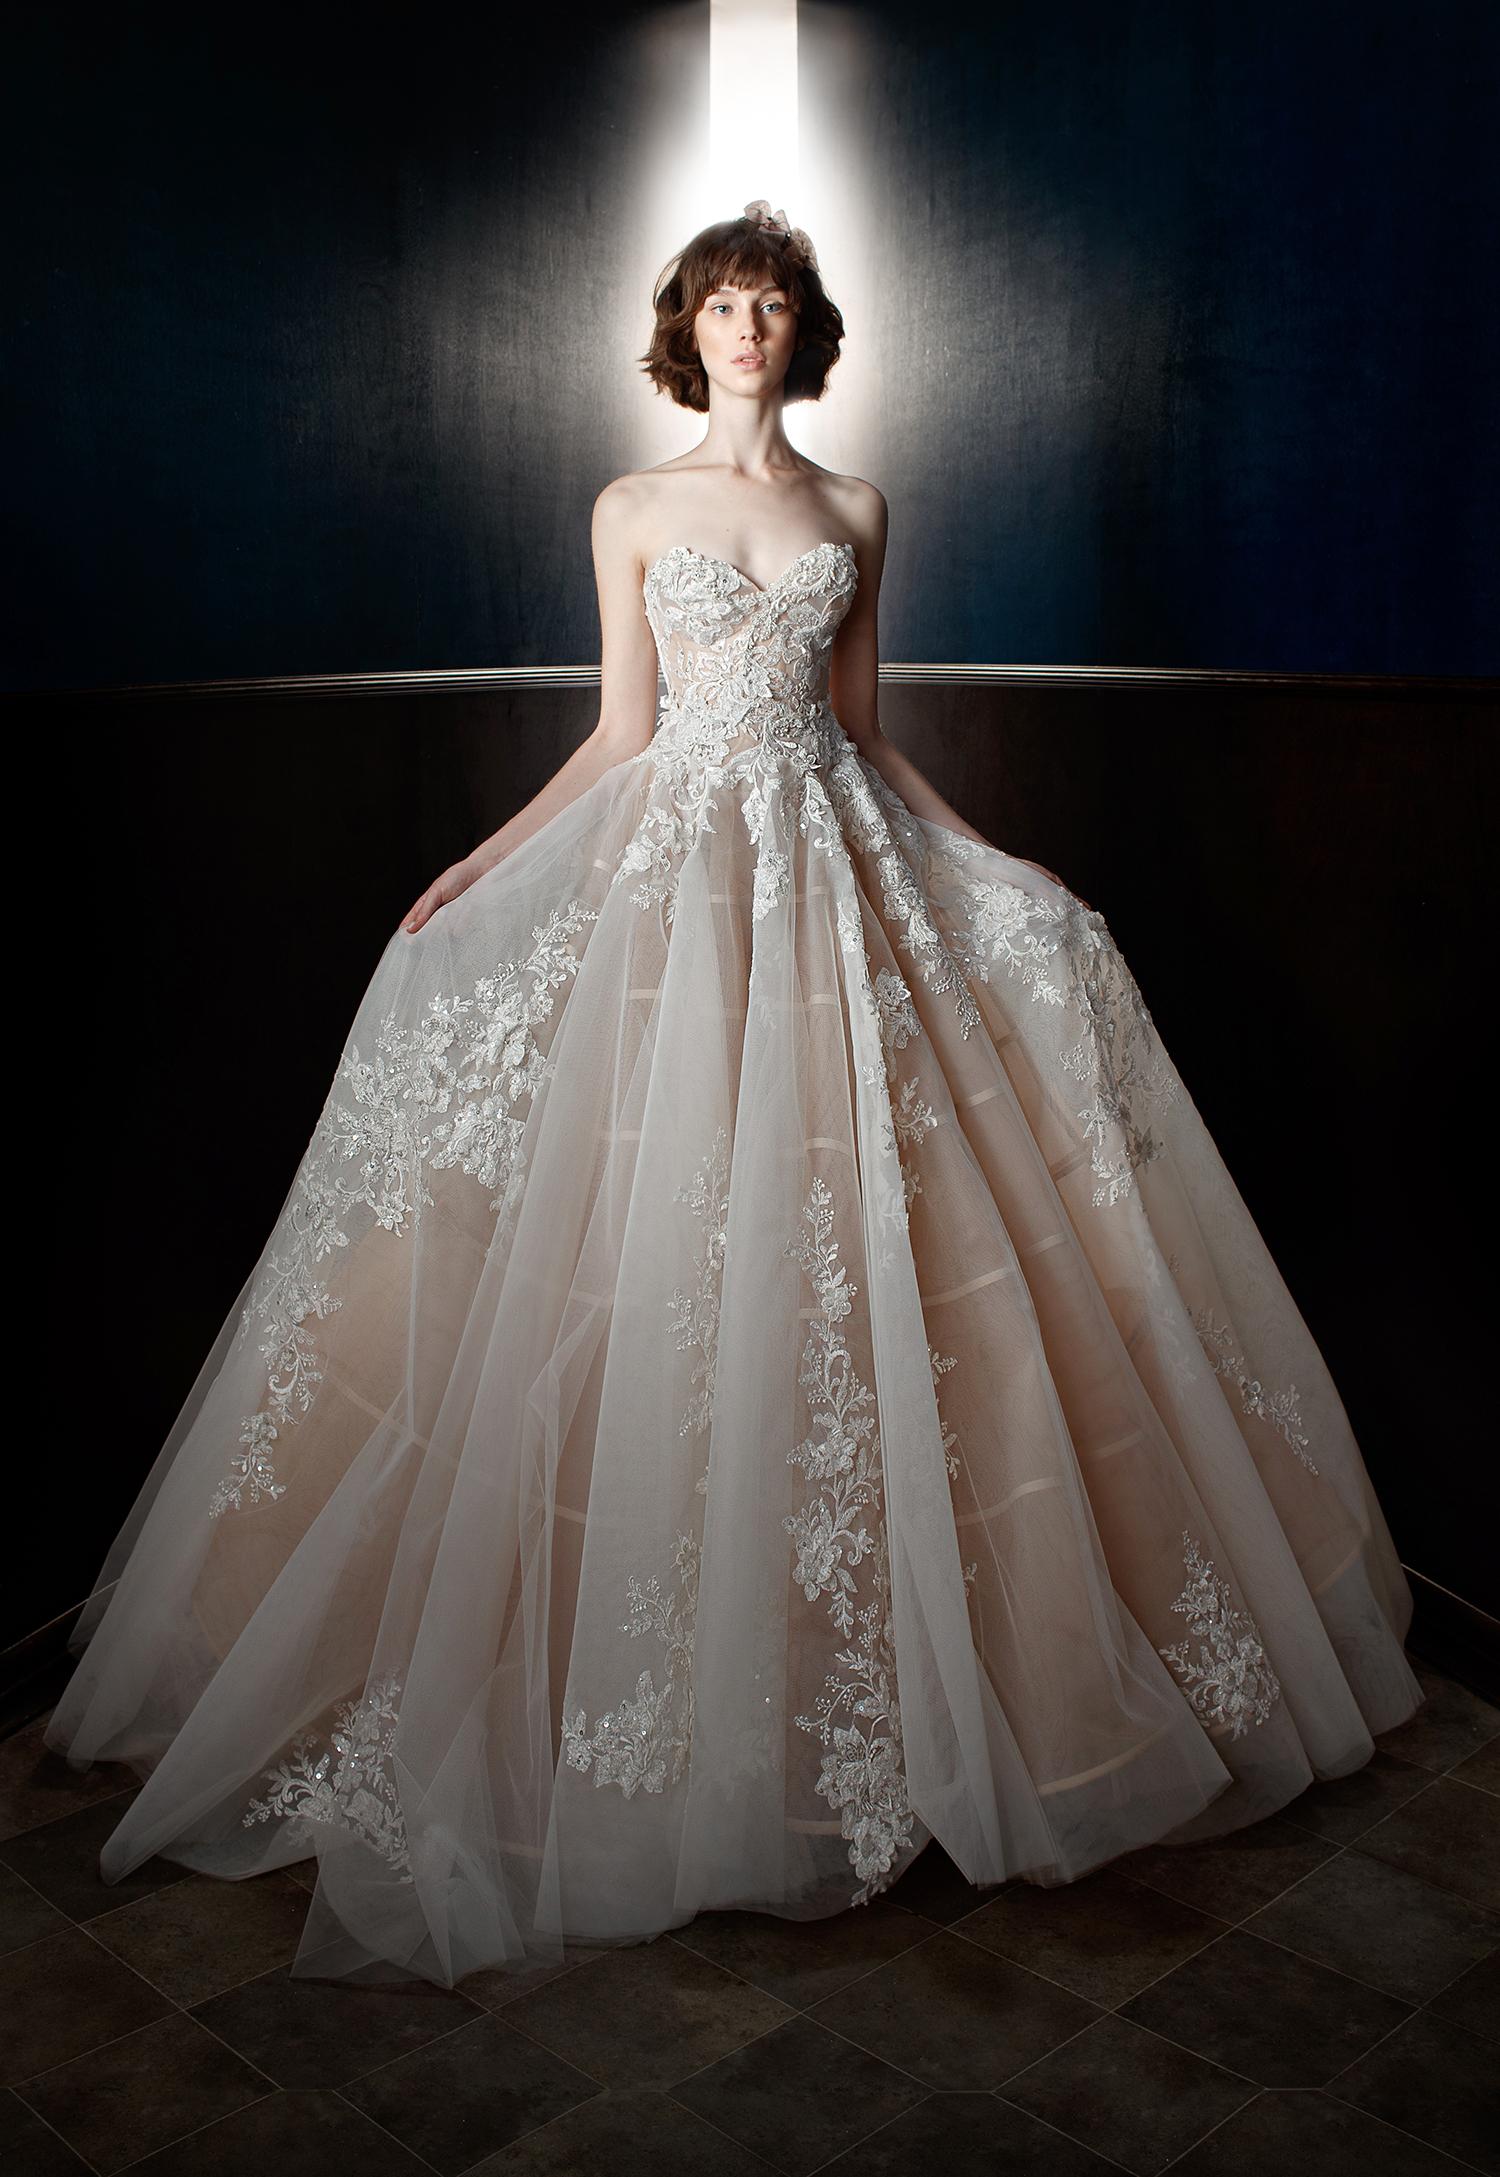 galia lahav wedding dress spring 2018 floral embroidered ballgown